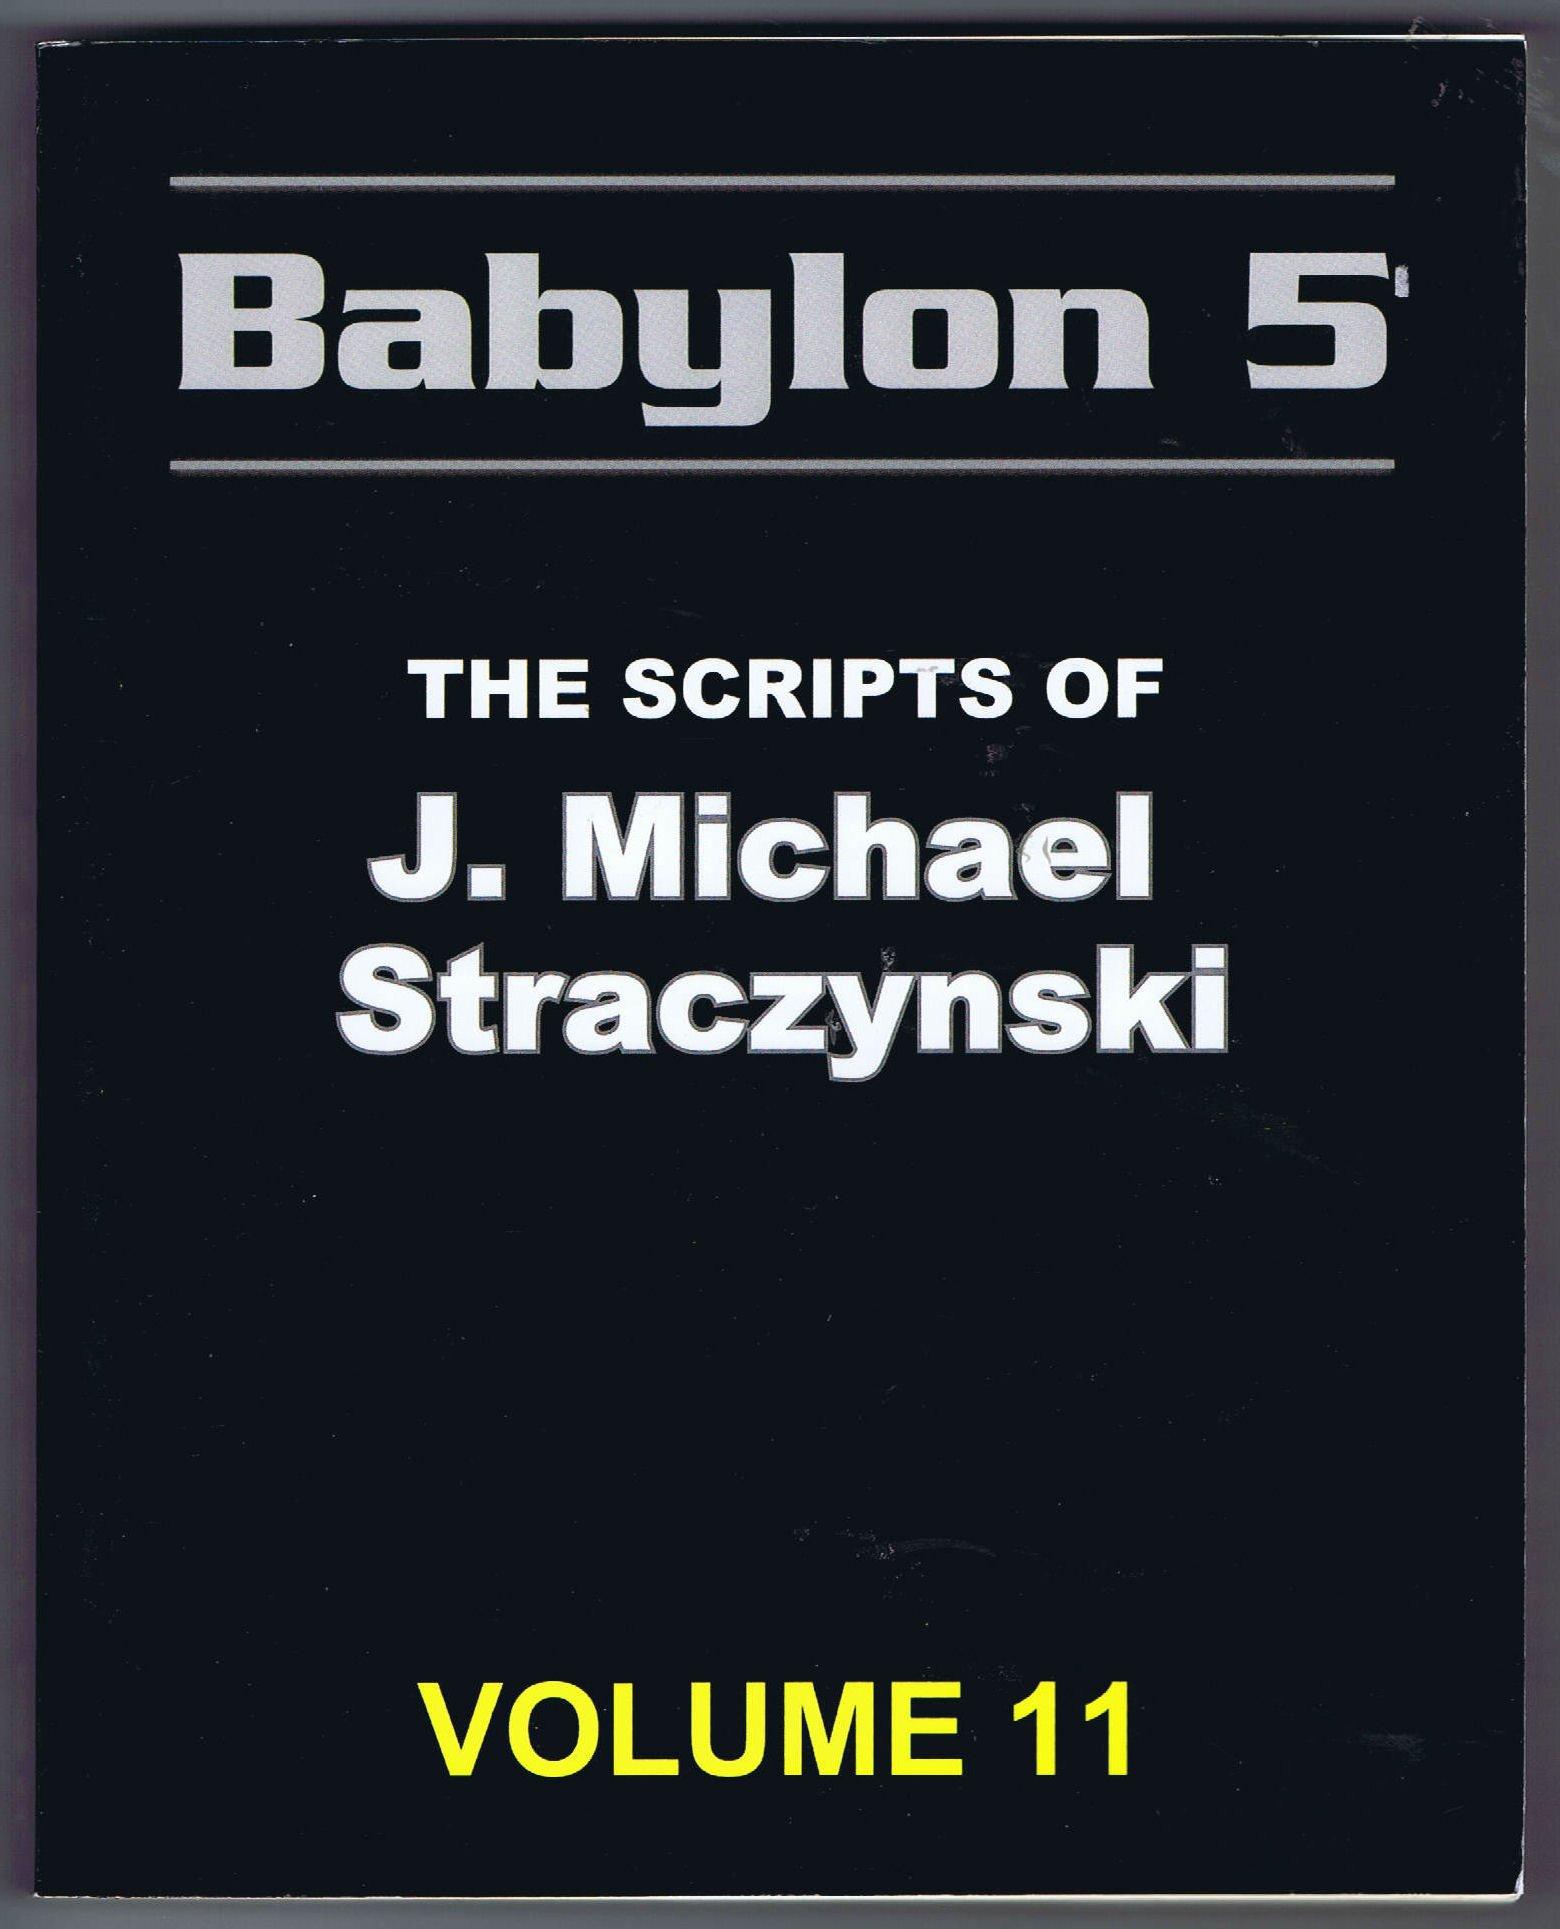 Download BABYLON 5 SCRIPT BOOKS : VOLUME 11 PDF Text fb2 ebook